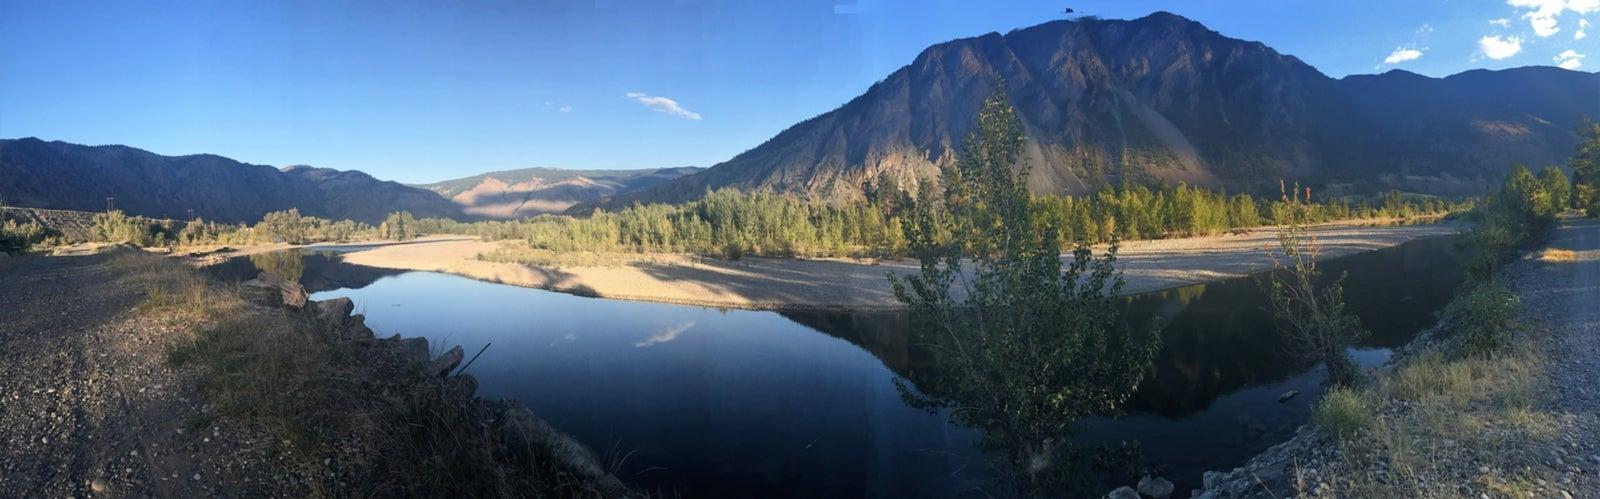 Similkameen River Keremeos BC